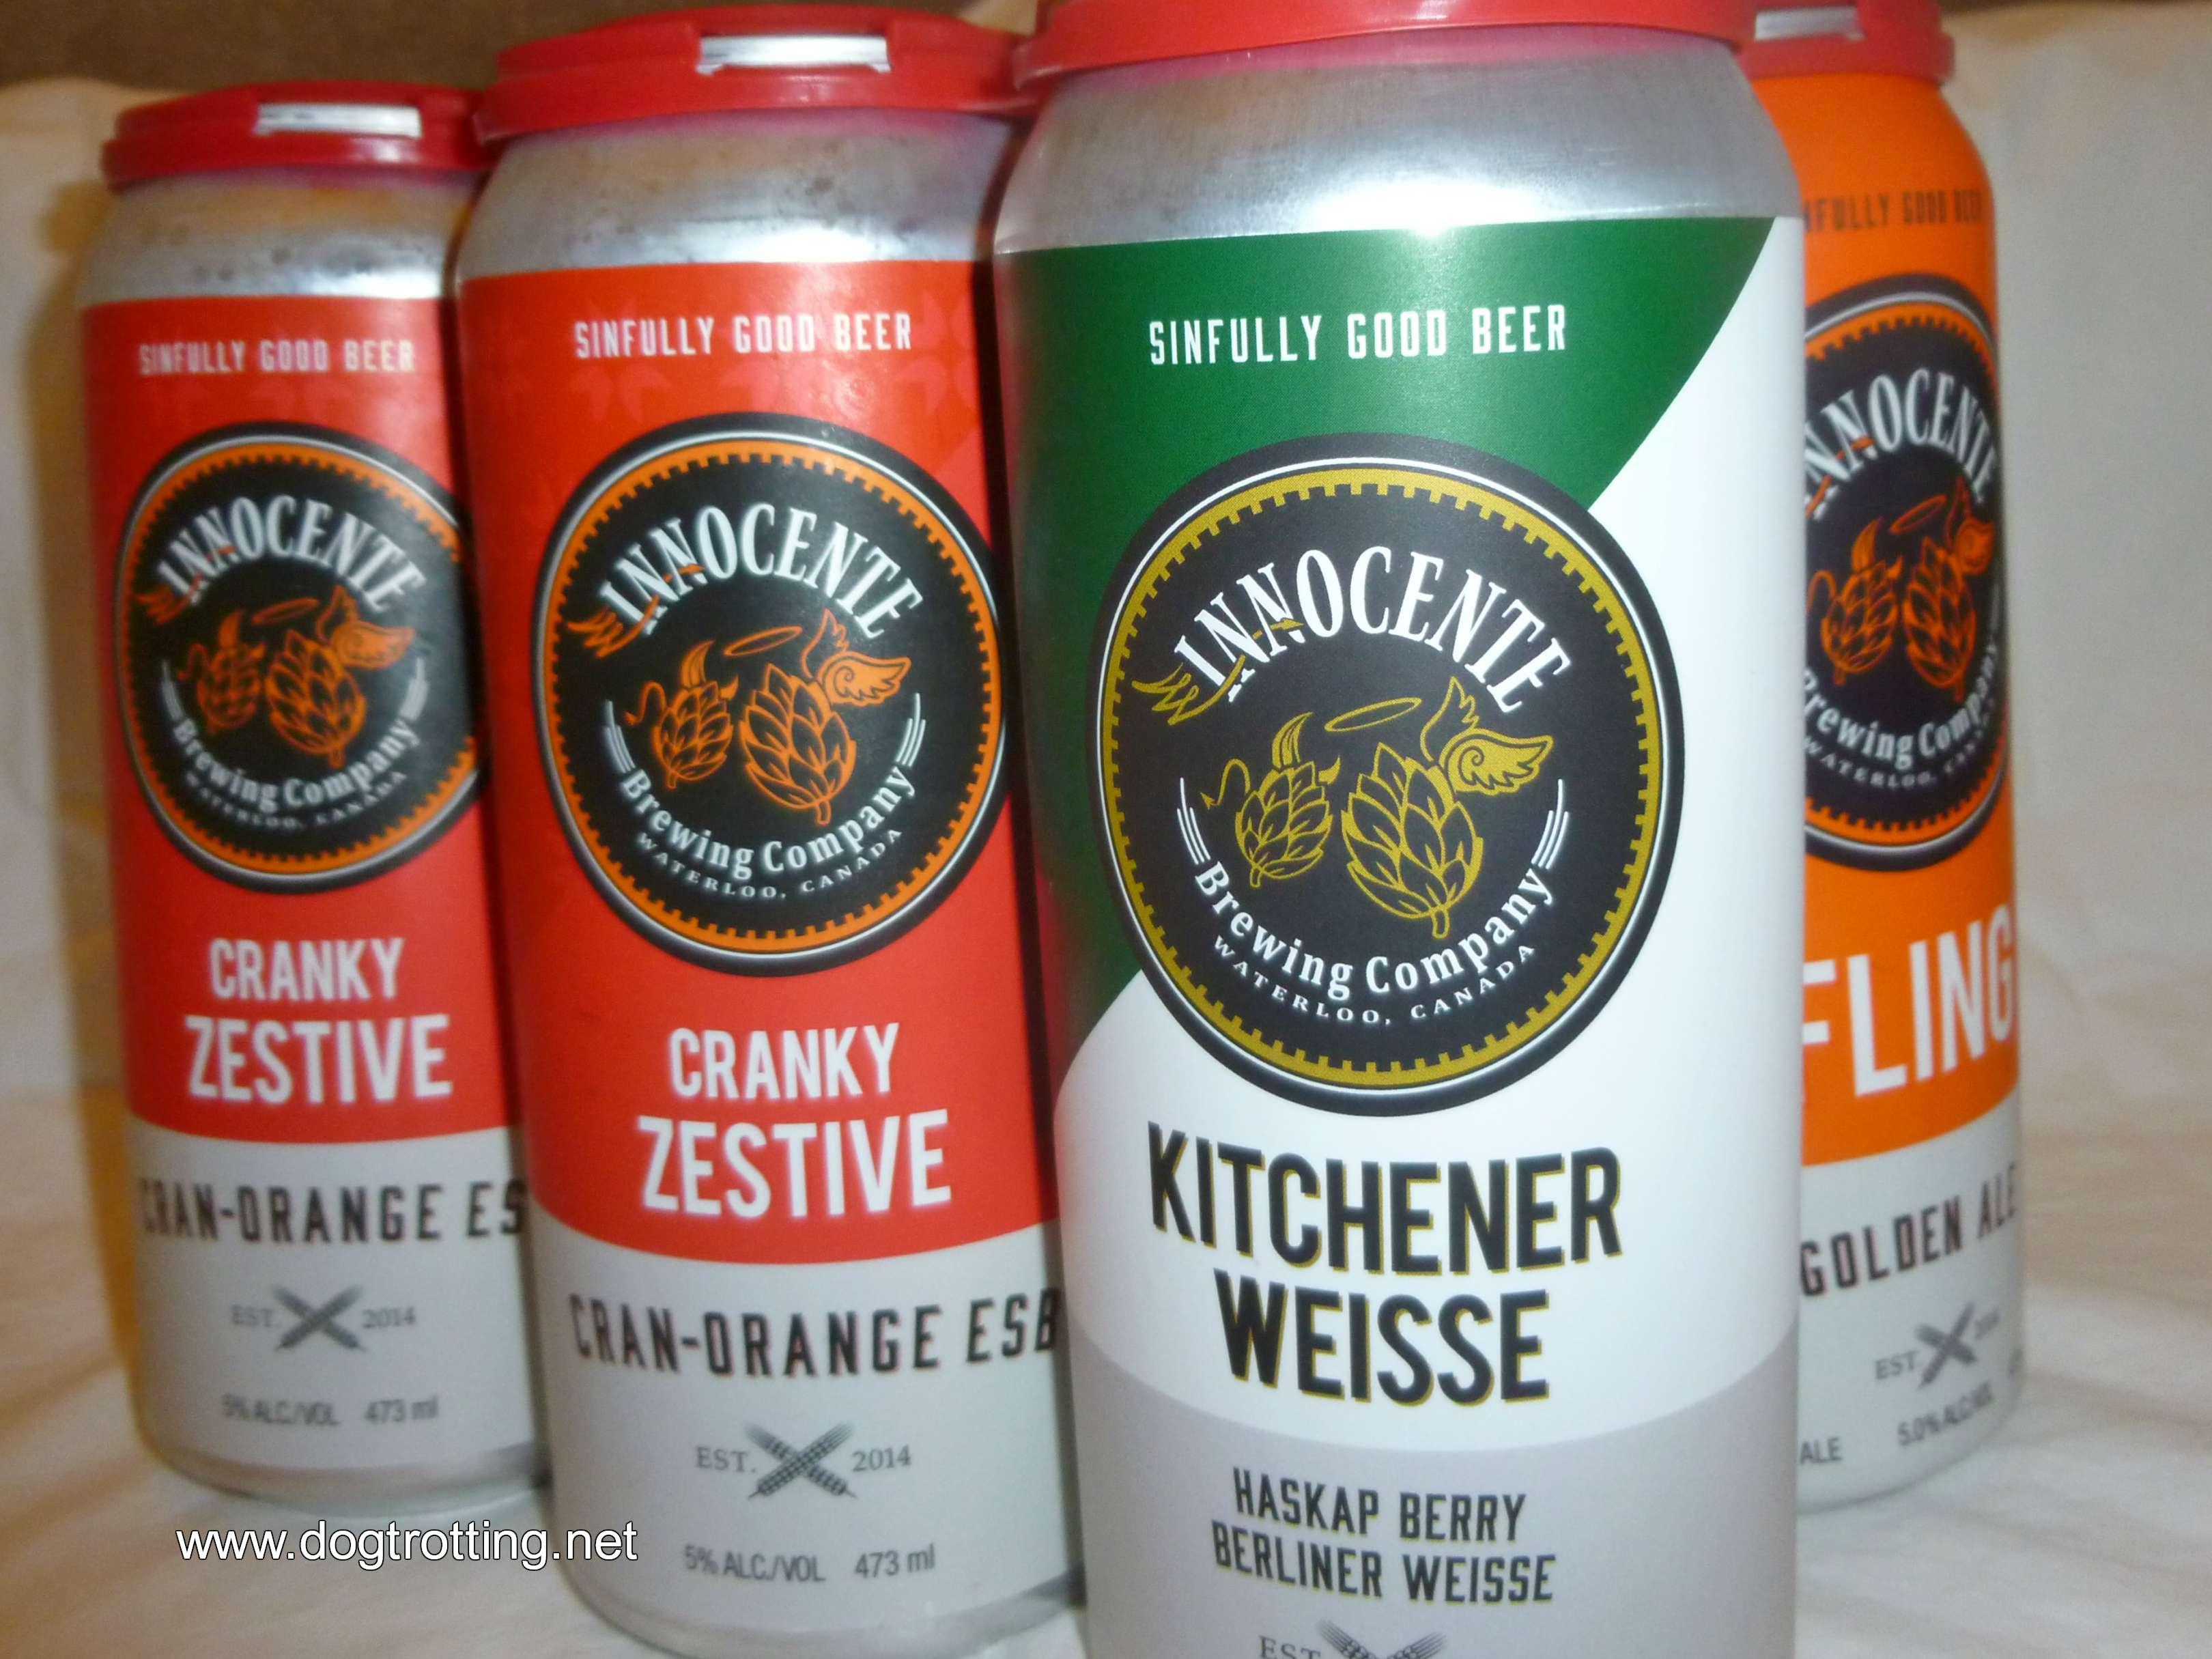 cans of Innocente beer